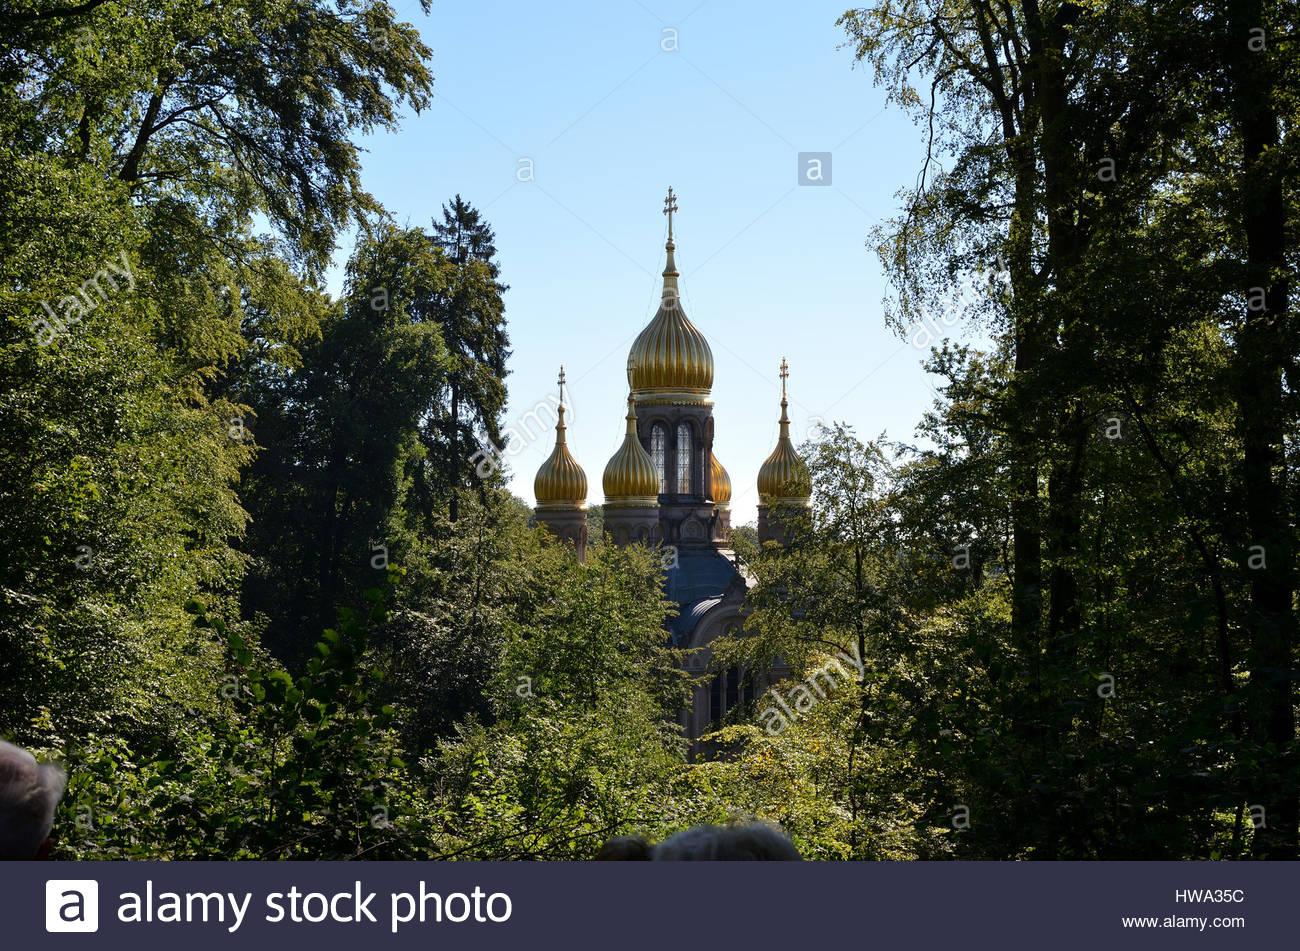 Russian Orthodox church among trees in Neroberg, Wiesbaden, Germany - Stock Image